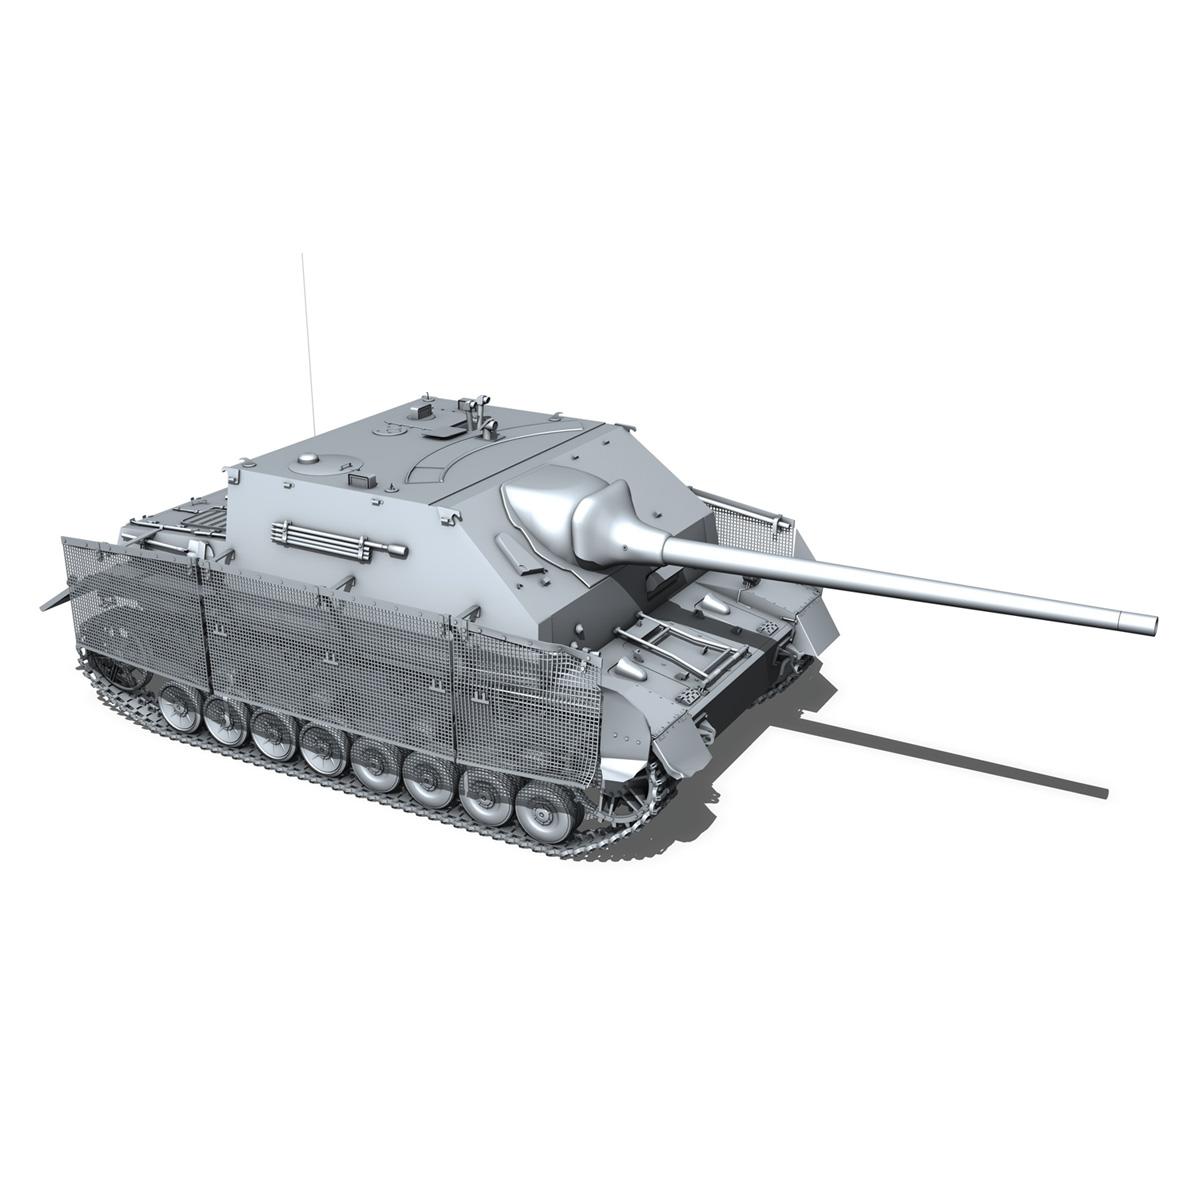 jagdpanzer iv l/70 (a) – sd.kfz 162/1 3d model 3ds fbx c4d lwo obj 202012